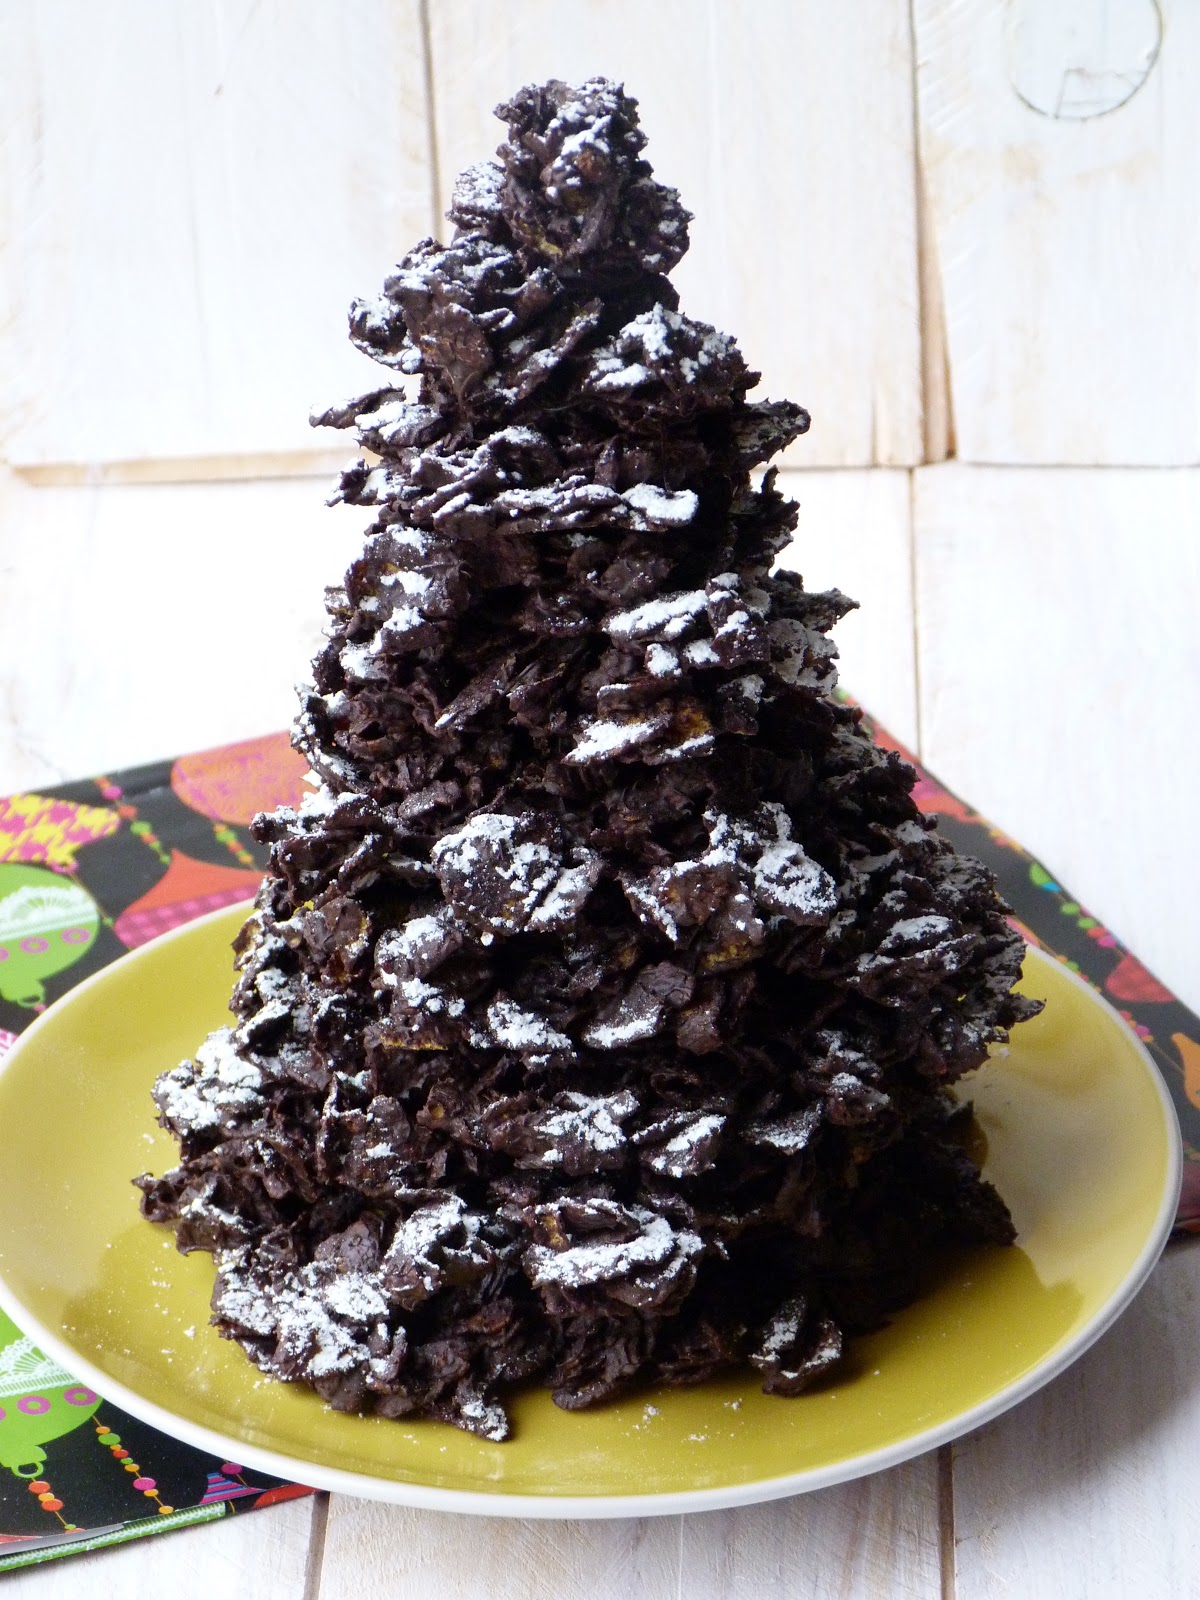 Chic chic chocolat sapin en chocolat cadeaux gourmands - Sapin avec cadeaux ...